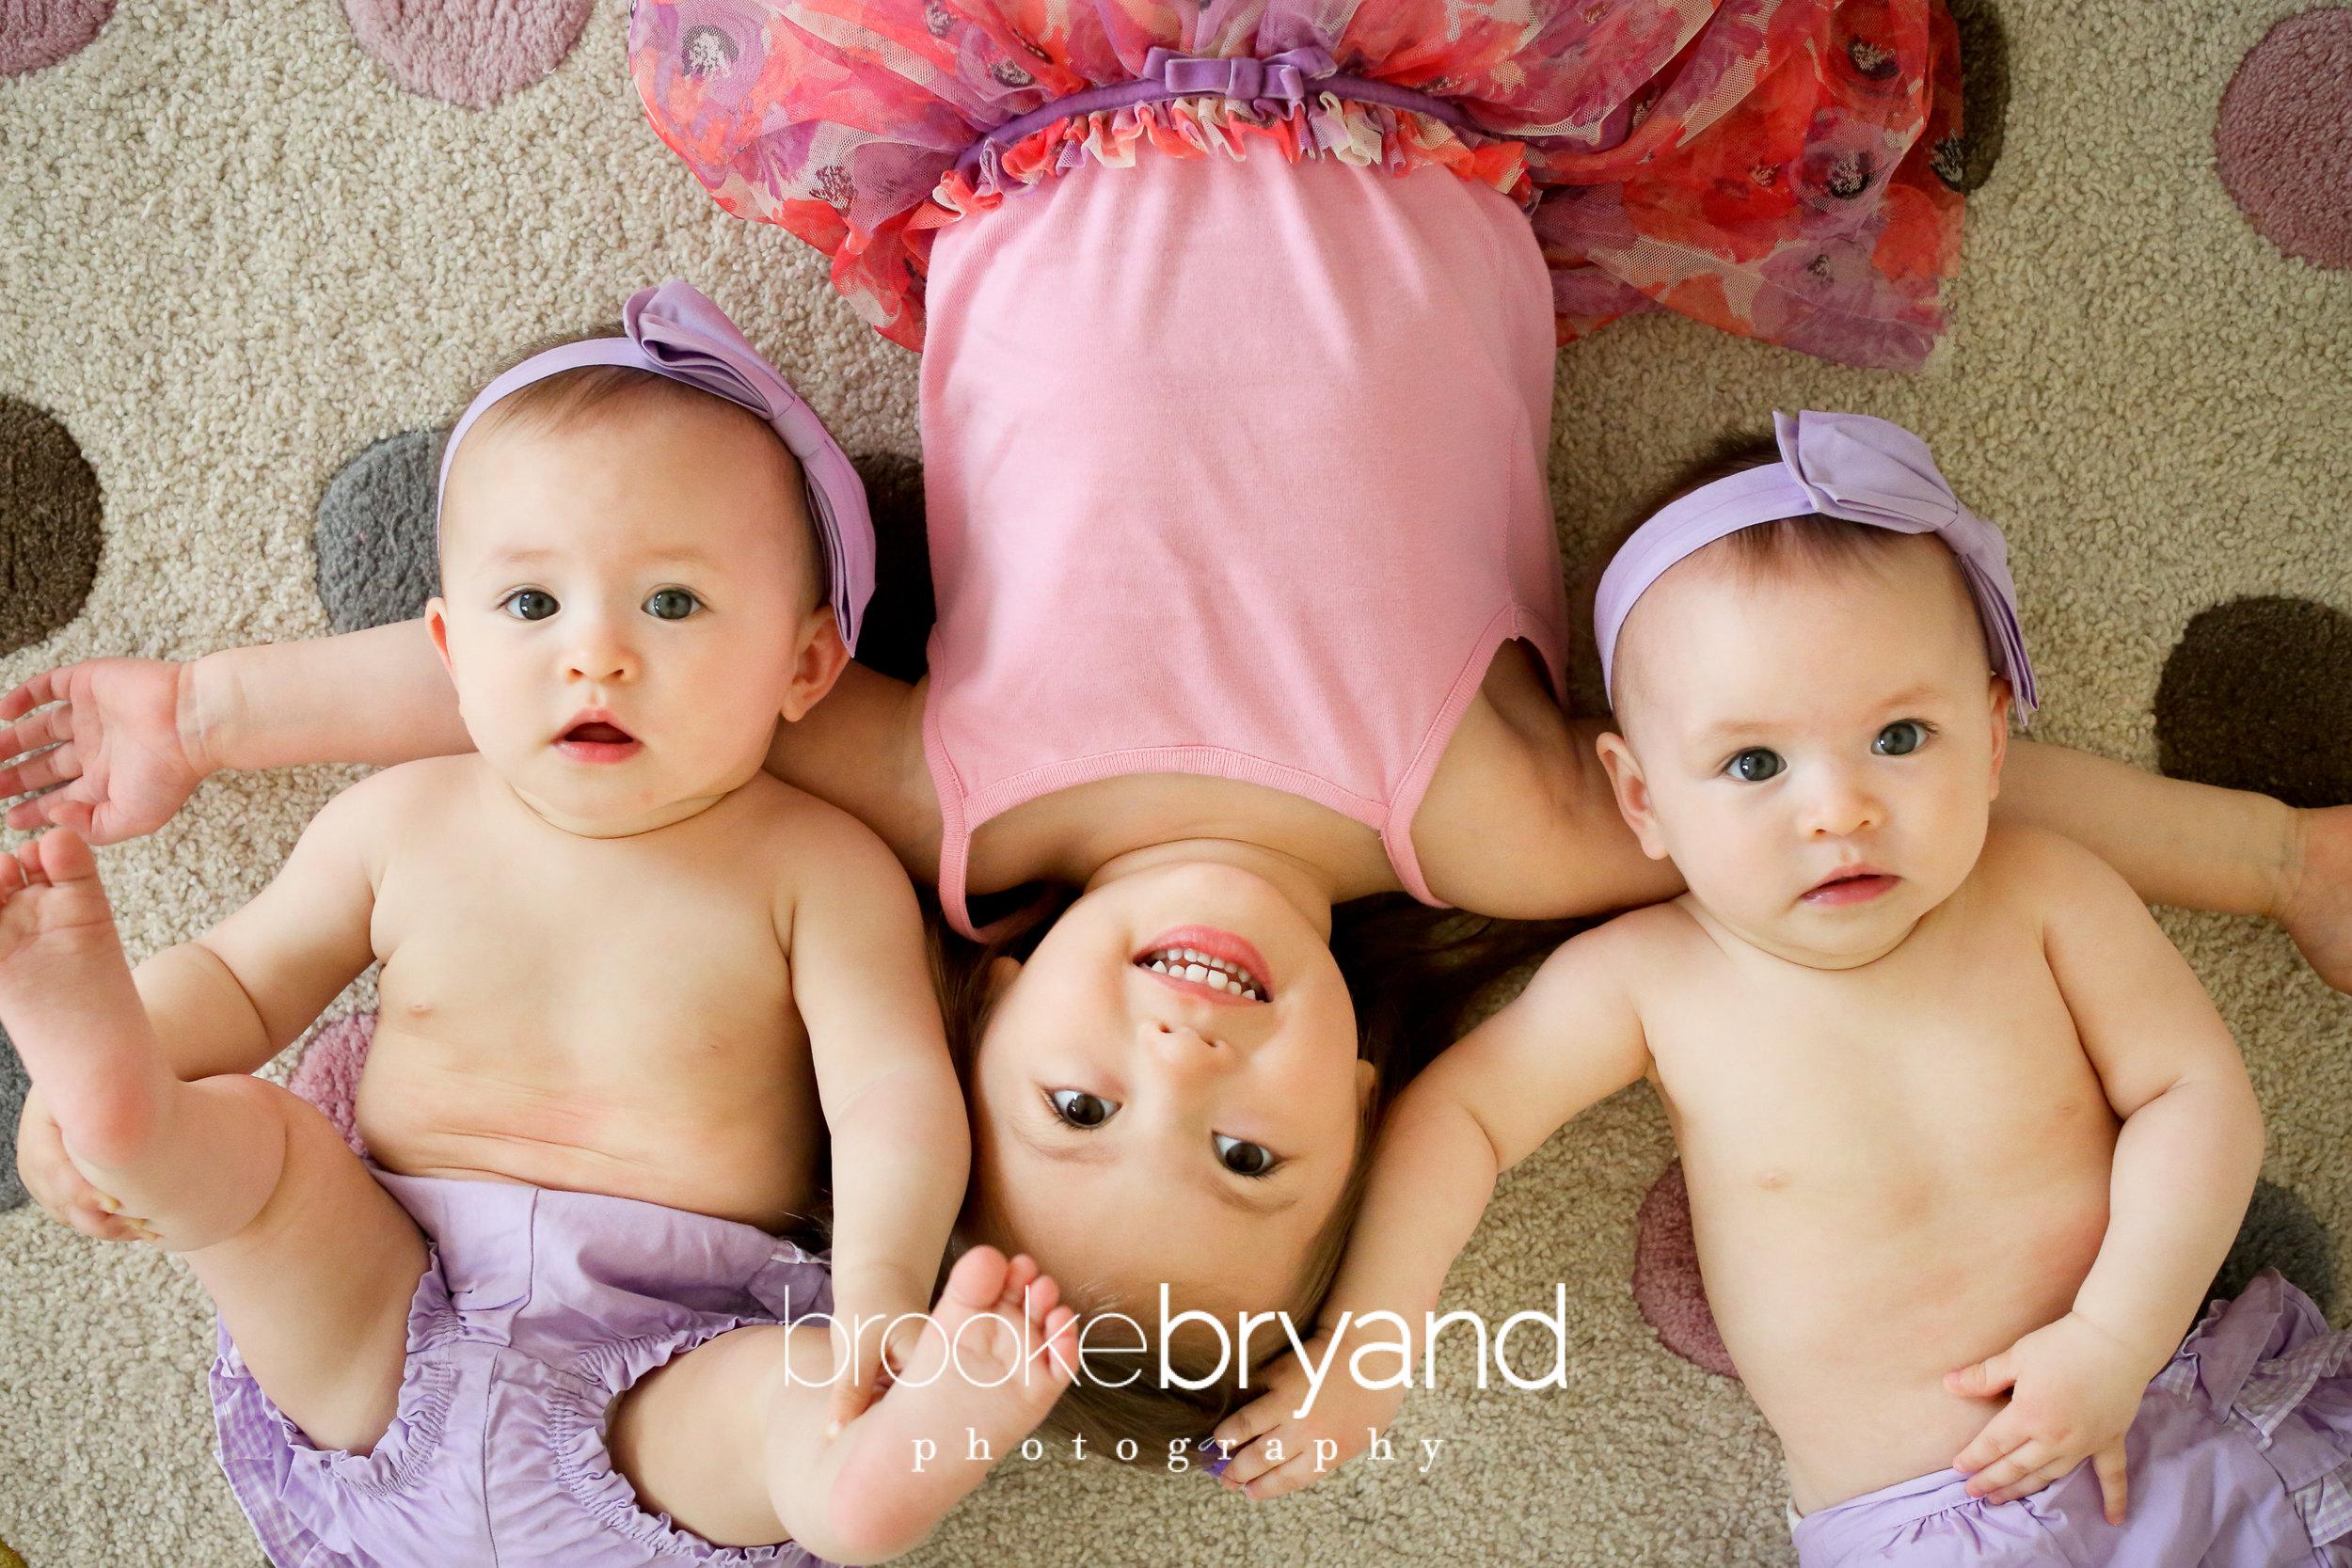 Brooke-Bryand-Photography-San-Francisco-Twins-Multiples-Photographer-IMG_1401.jpg